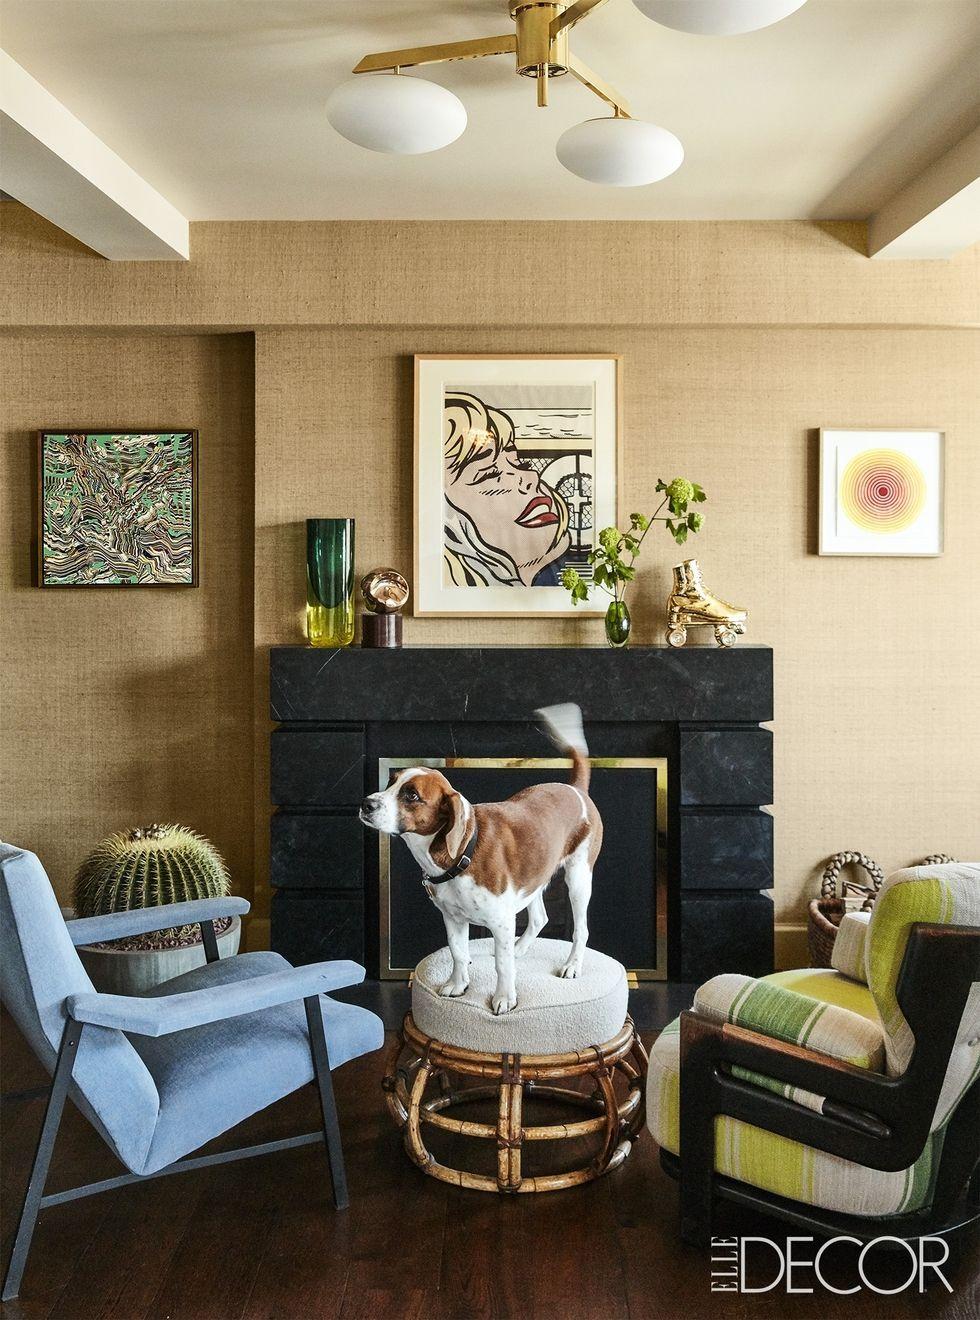 41 Best Wall Decor Ideas - Style a Boring Wall on Wall Decoration Ideas  id=28581